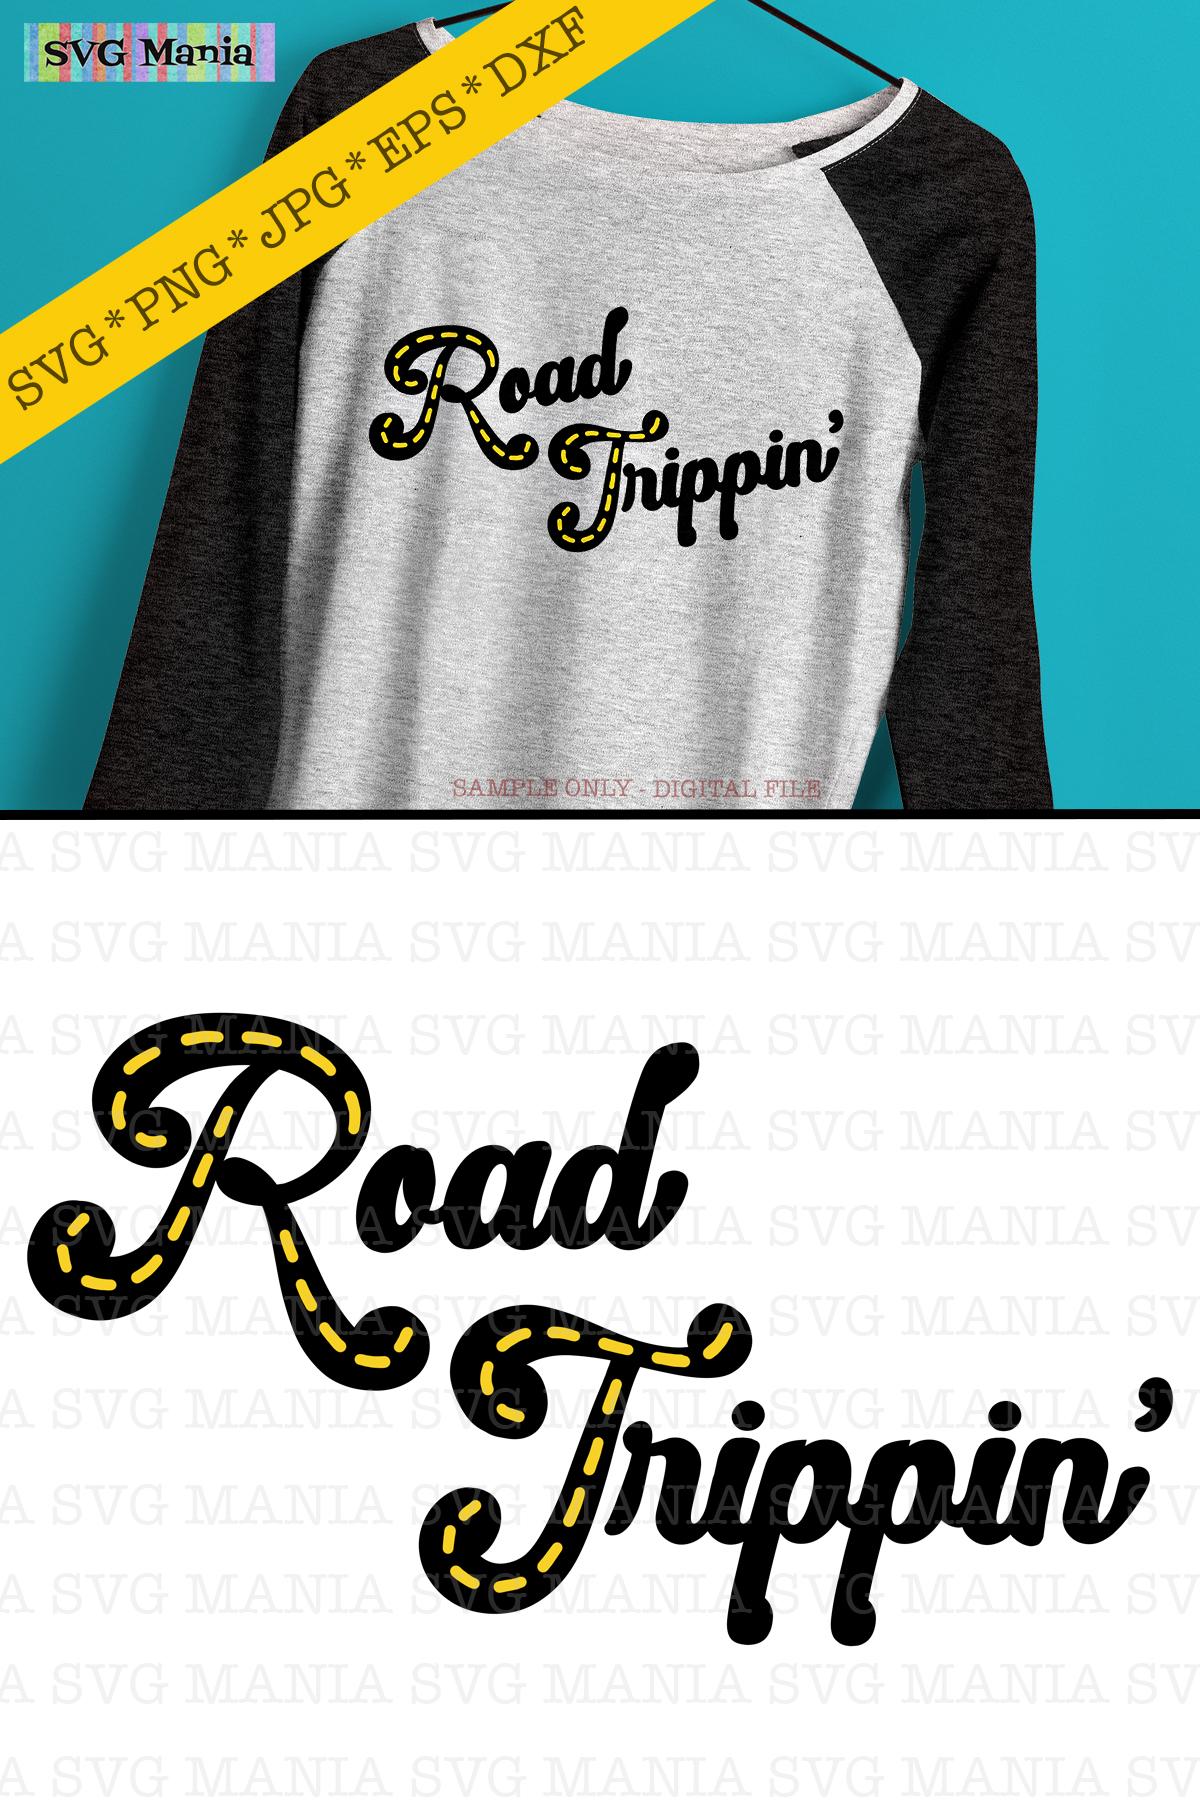 Road Trip Shirt SVG, Matching Vacation Shirt SVG File, SVG example image 2